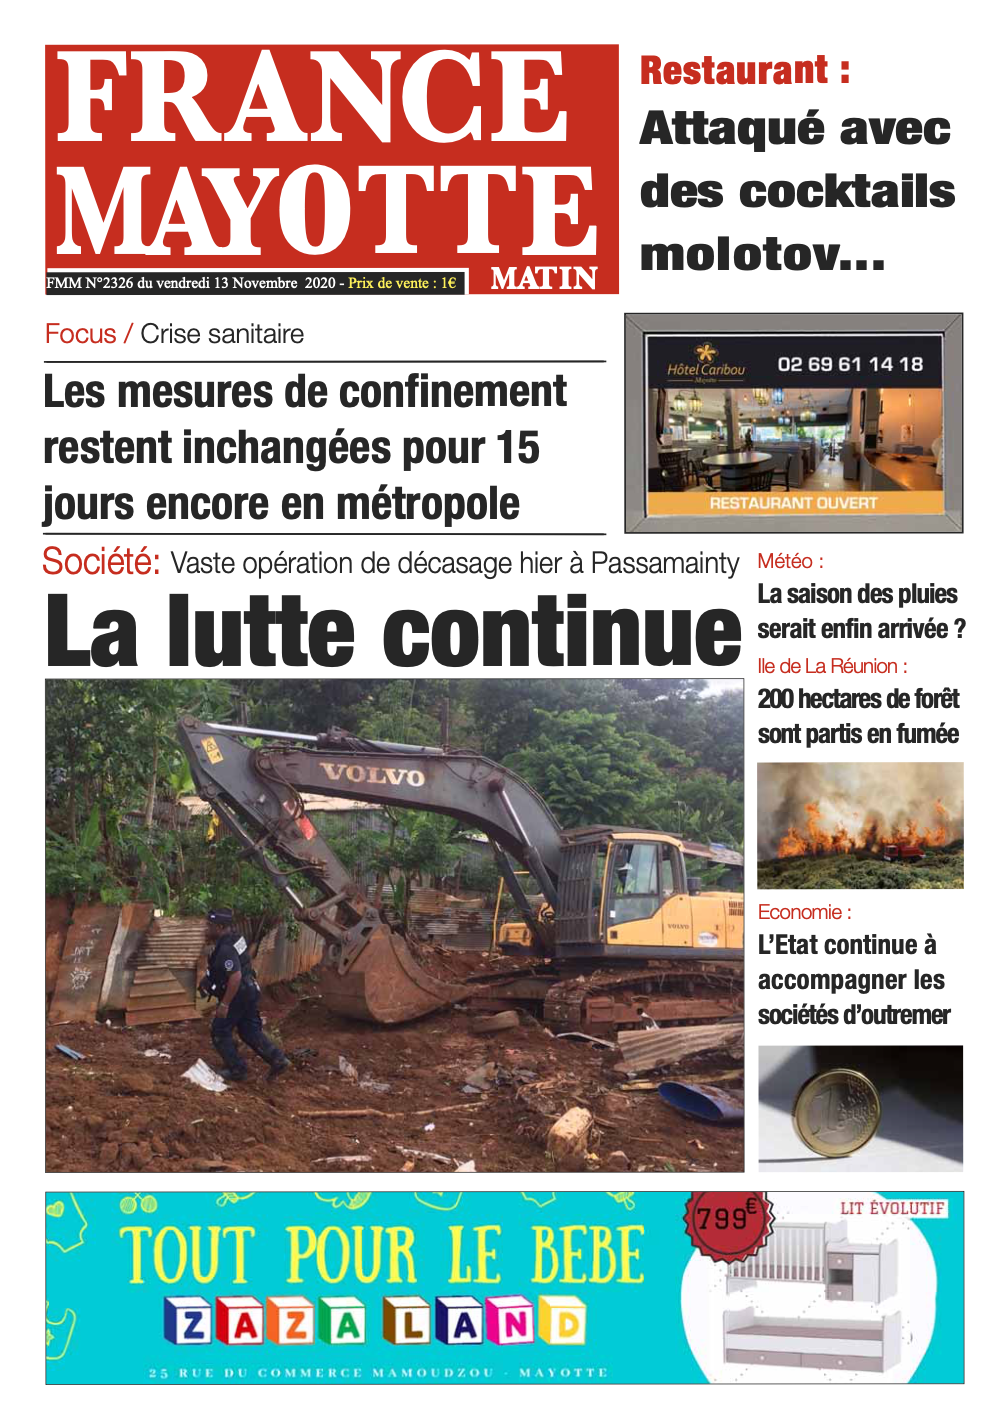 France Mayotte Vendredi 13 novembre 2020